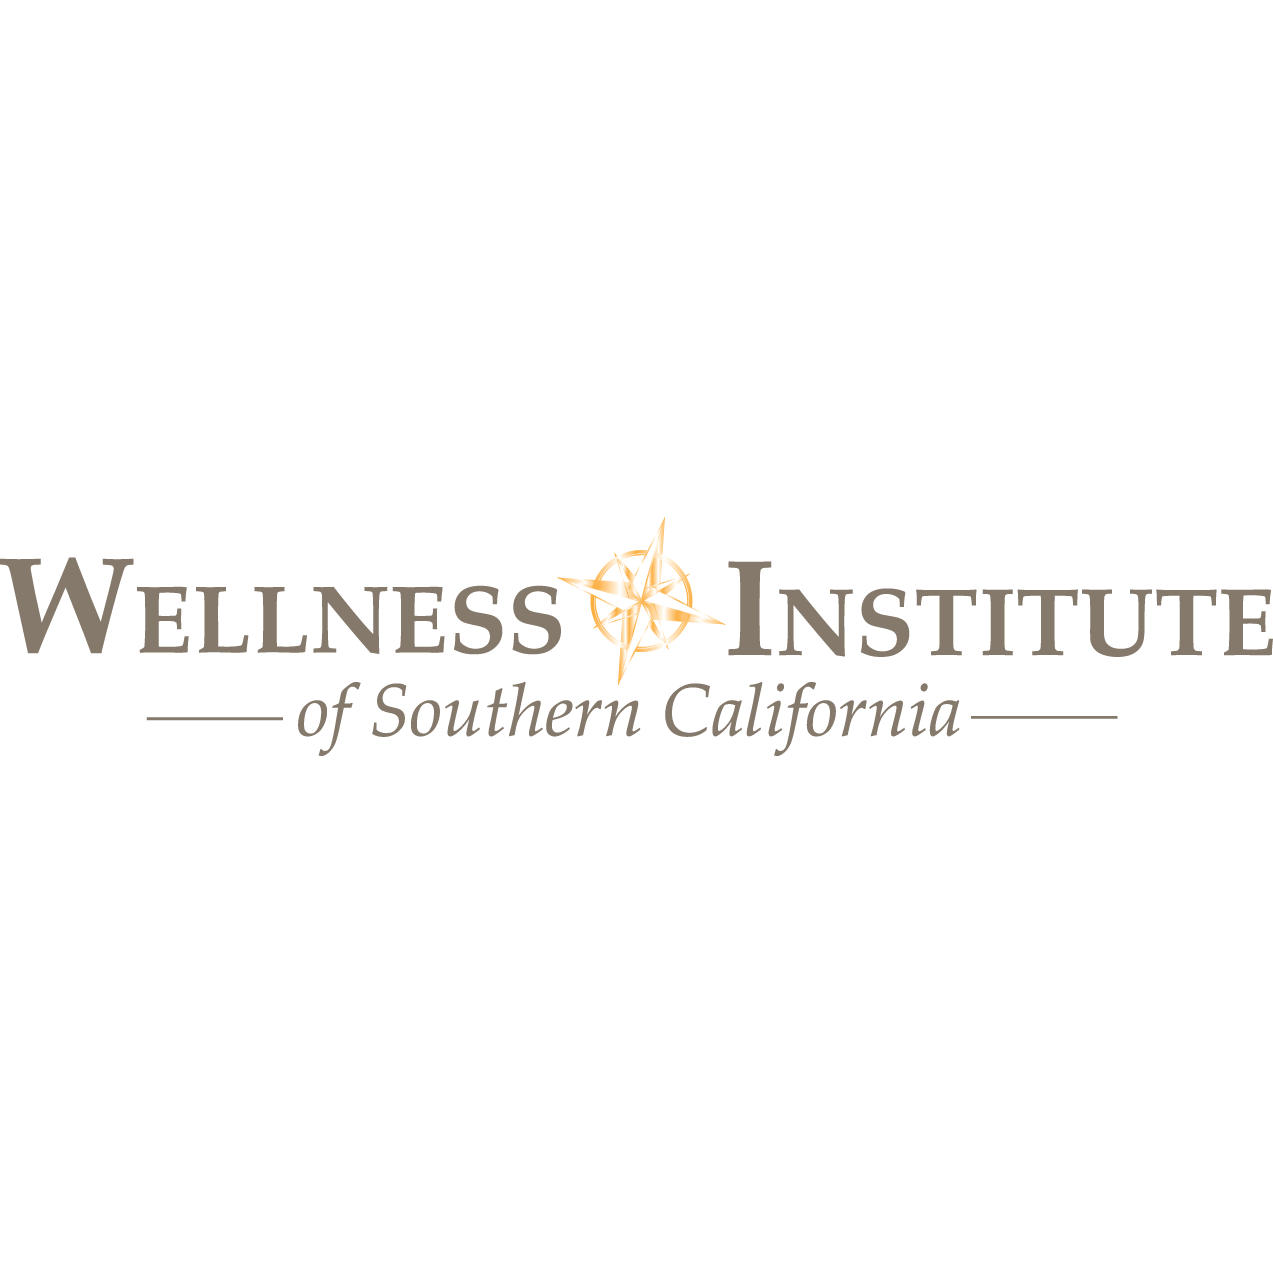 Wellness Institute of Southern California